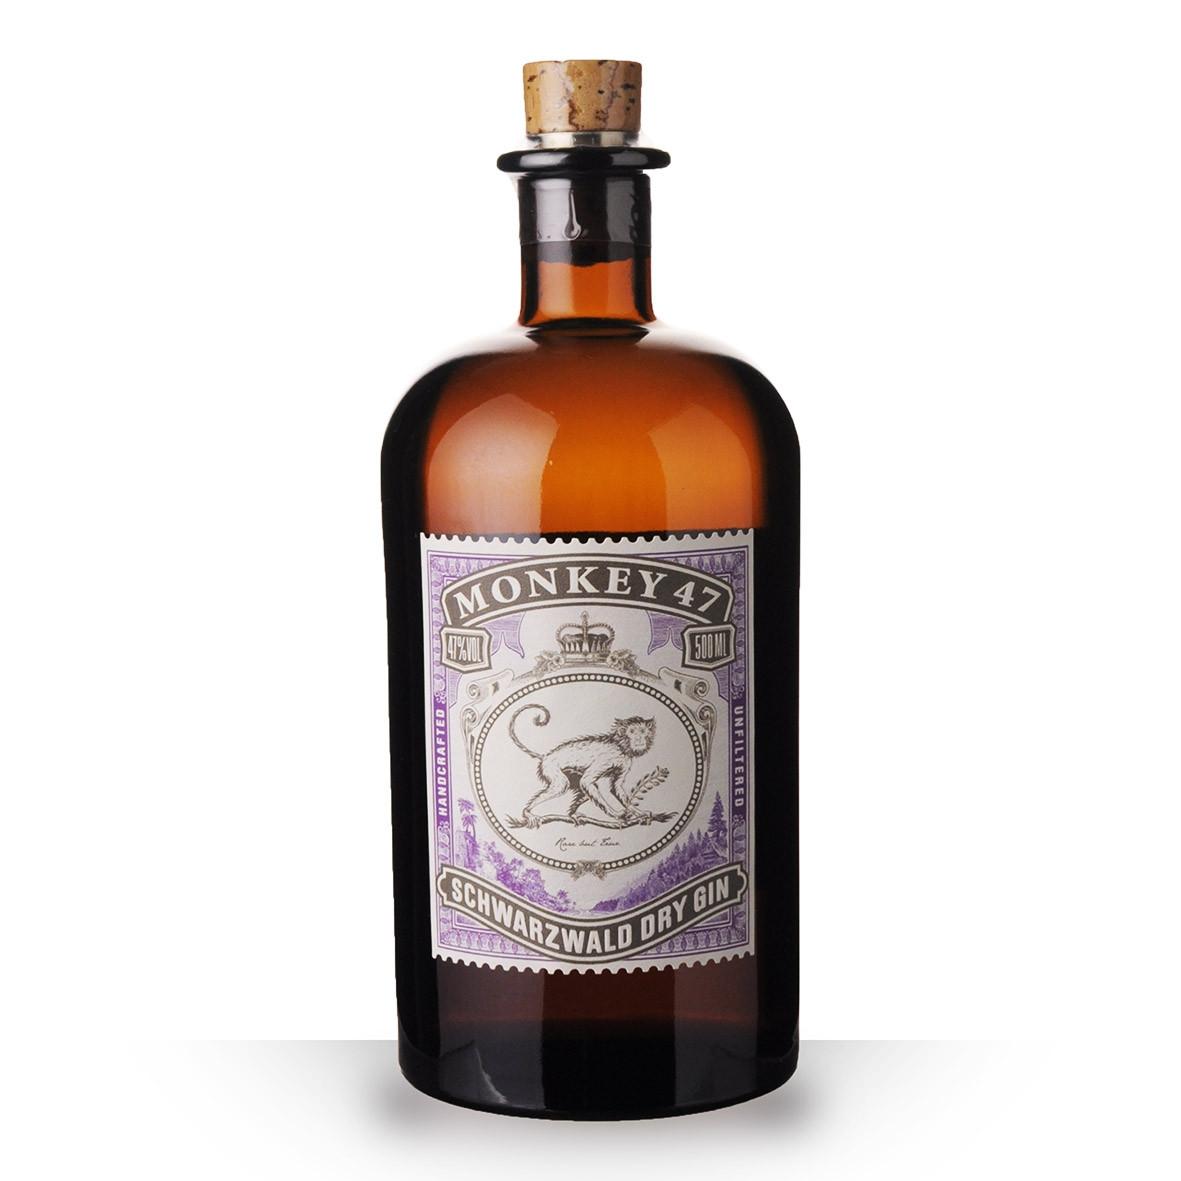 Gin Monkey 47 Dry Gin 50cl www.odyssee-vins.com